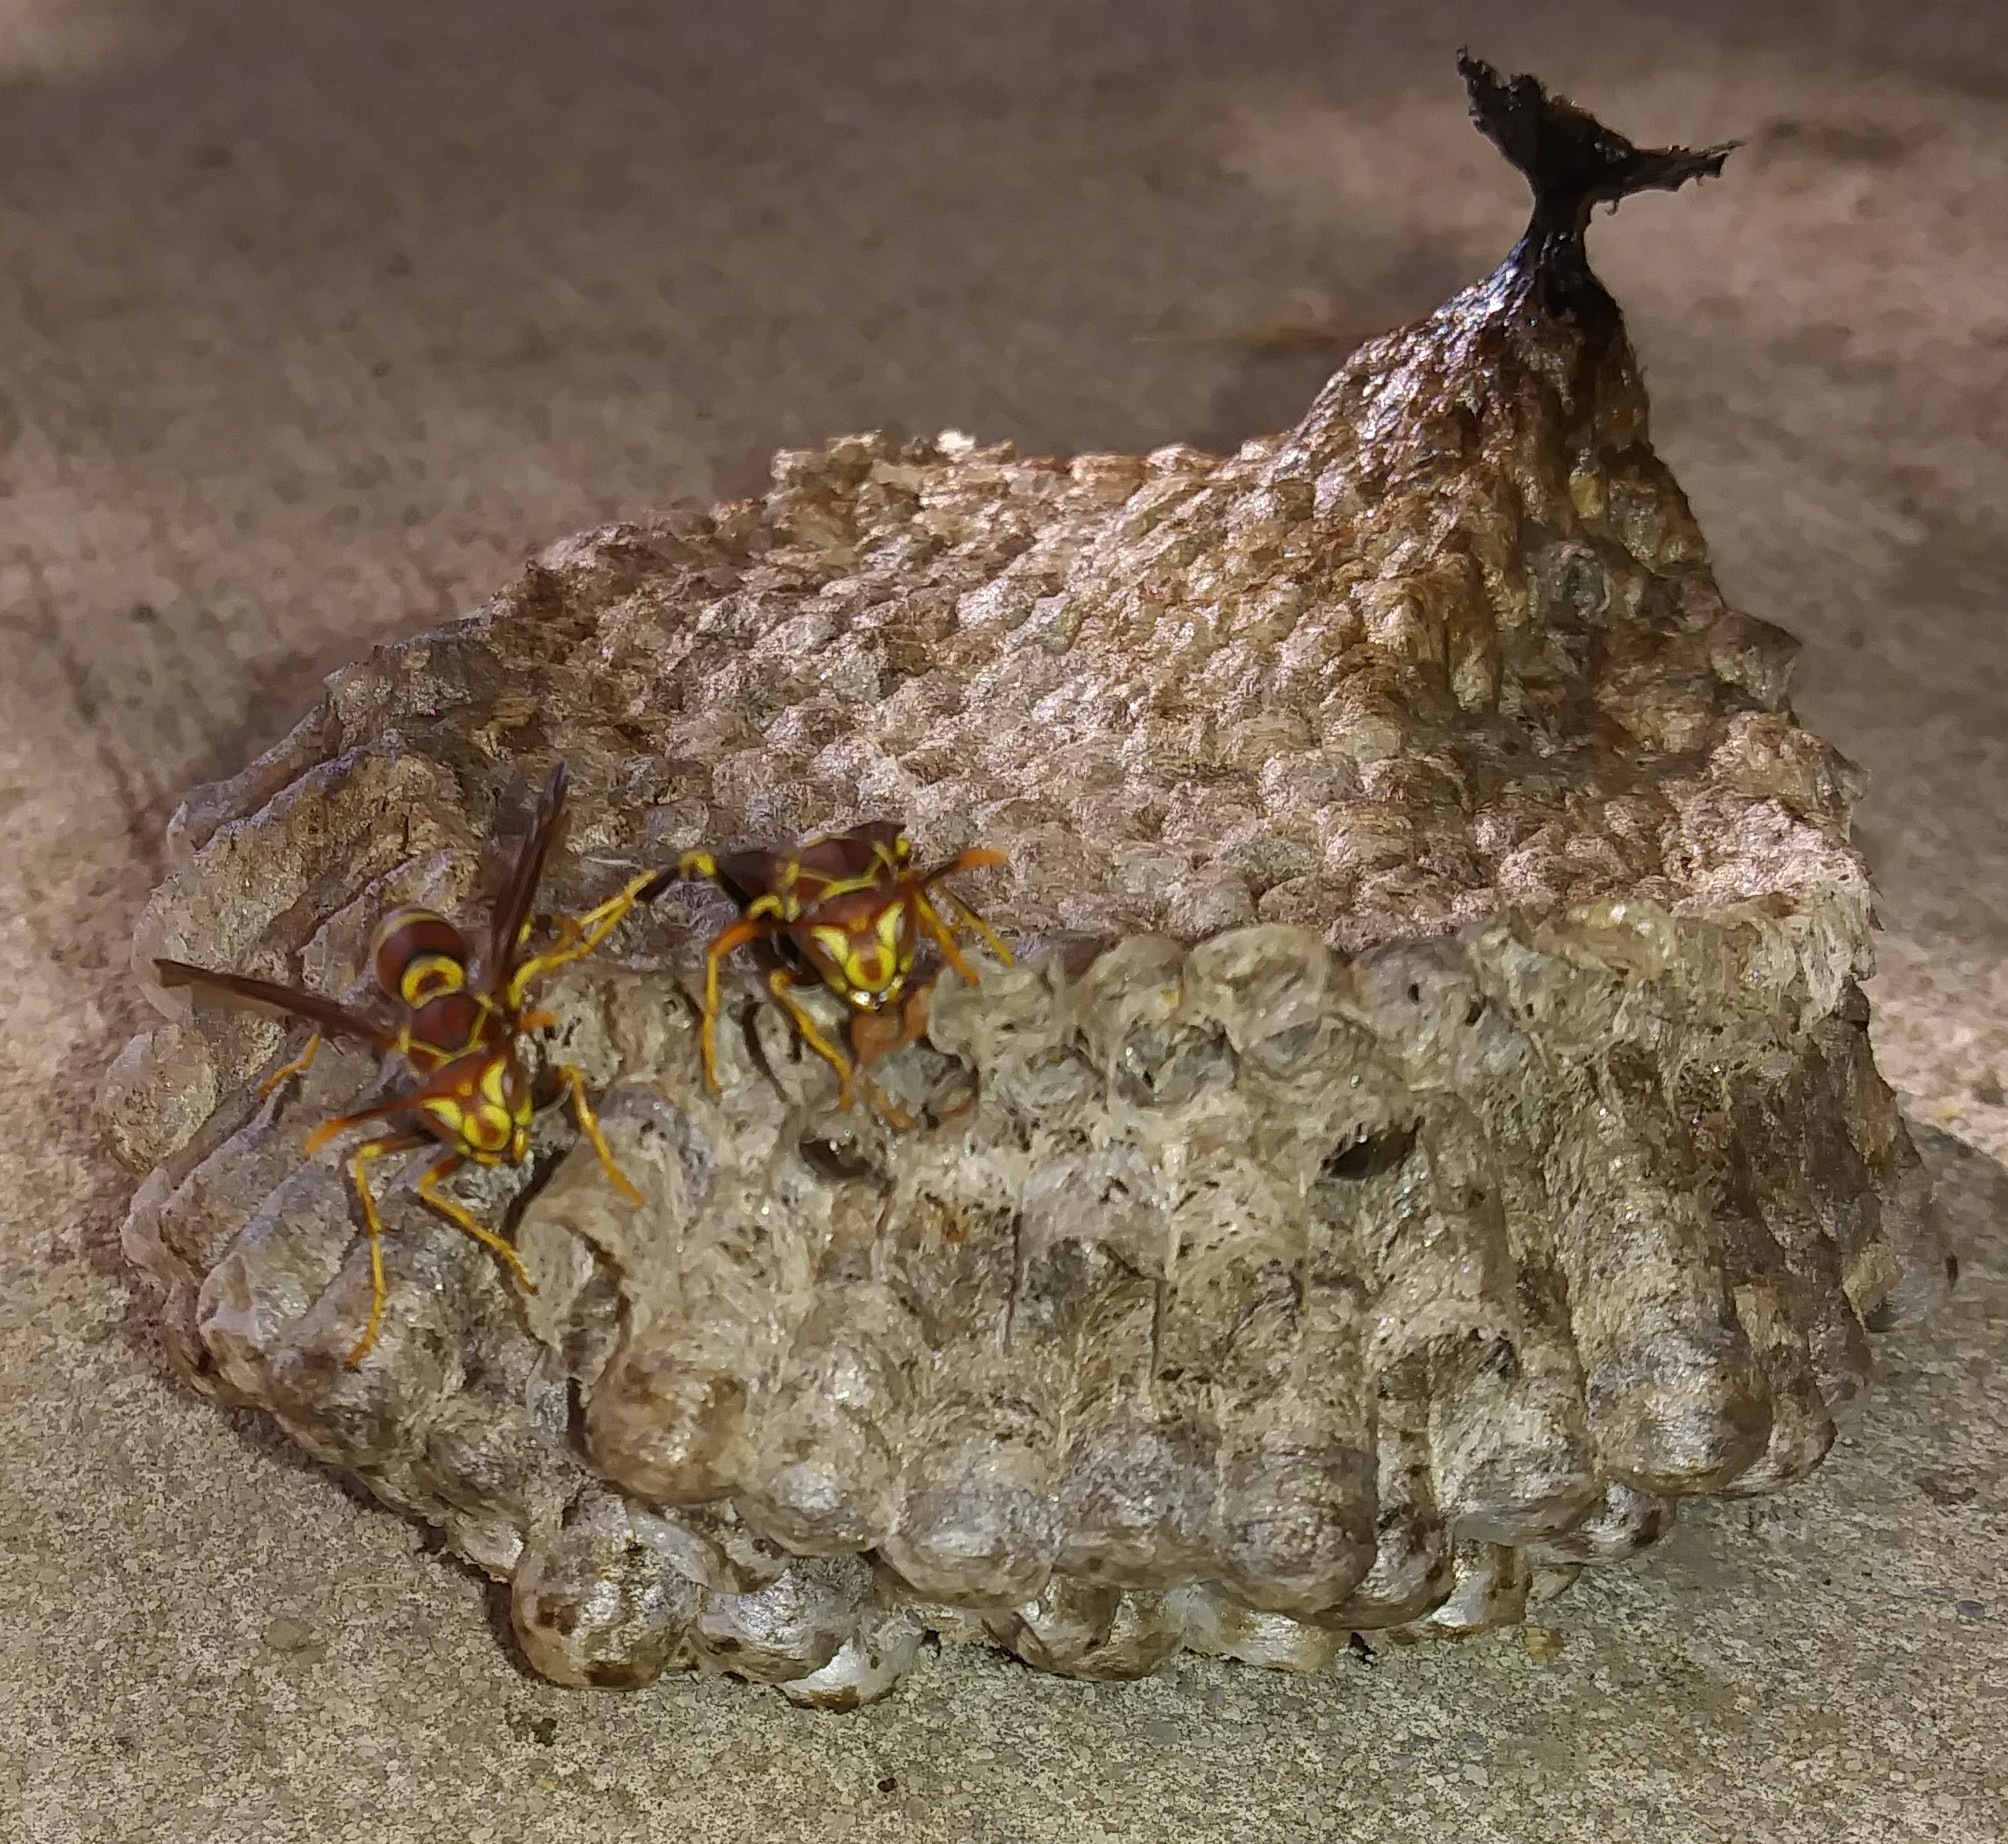 Fallen Nest1 by Angela Mason